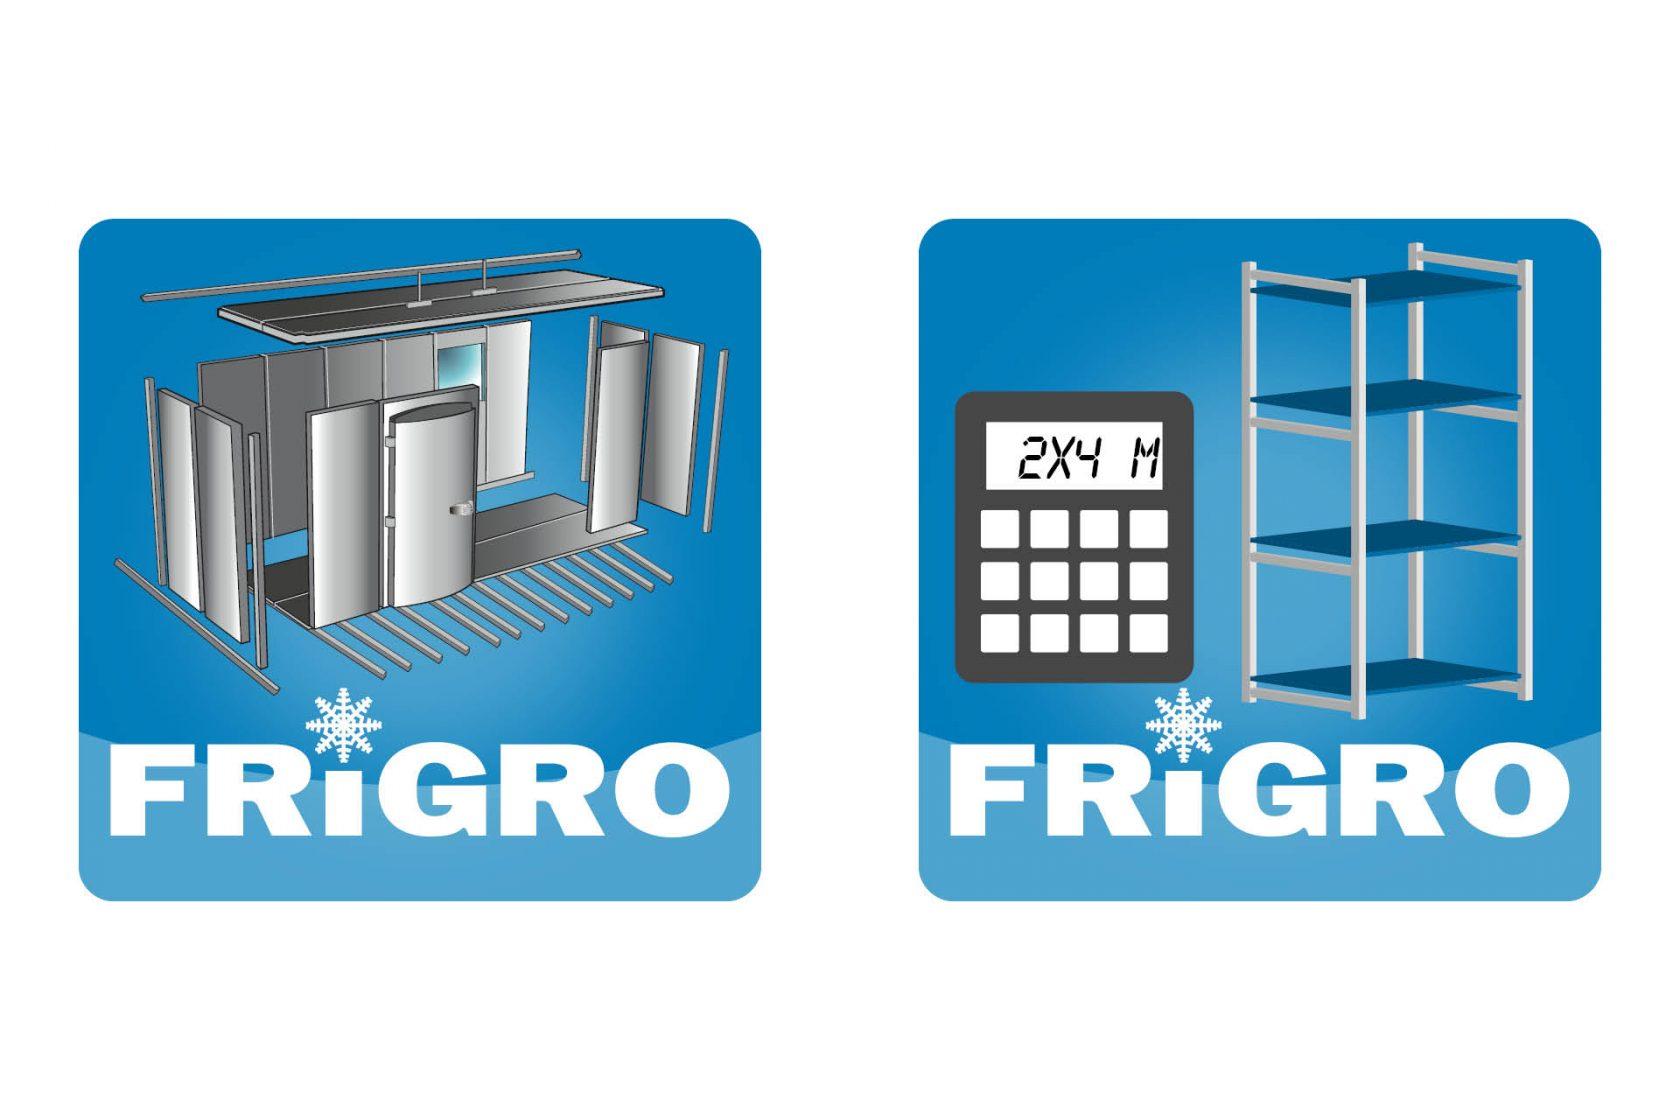 Frigro online tools